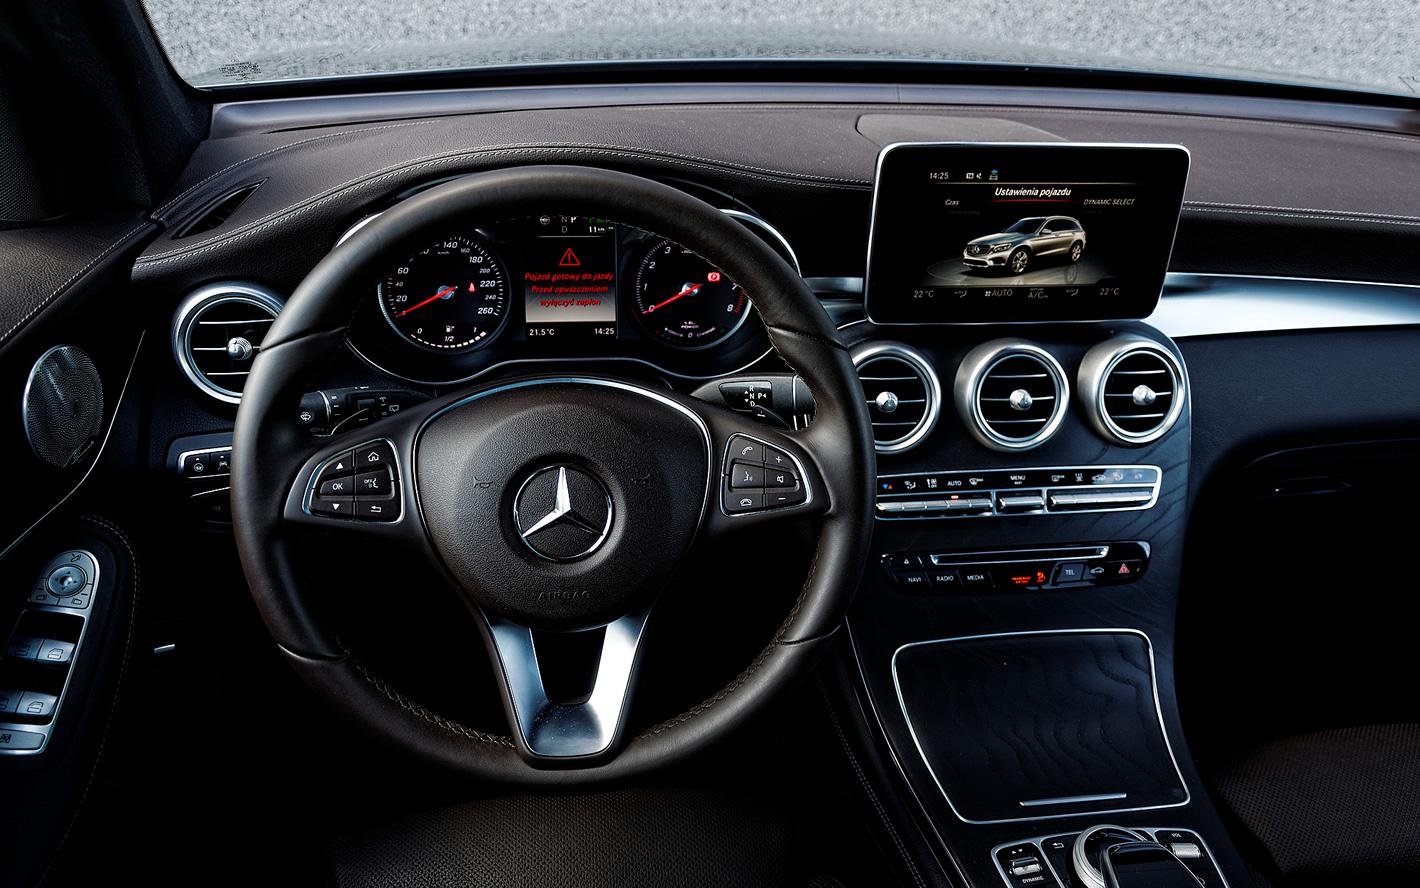 Kierownica wMercedes-Benz GLC 350 e 4Matic